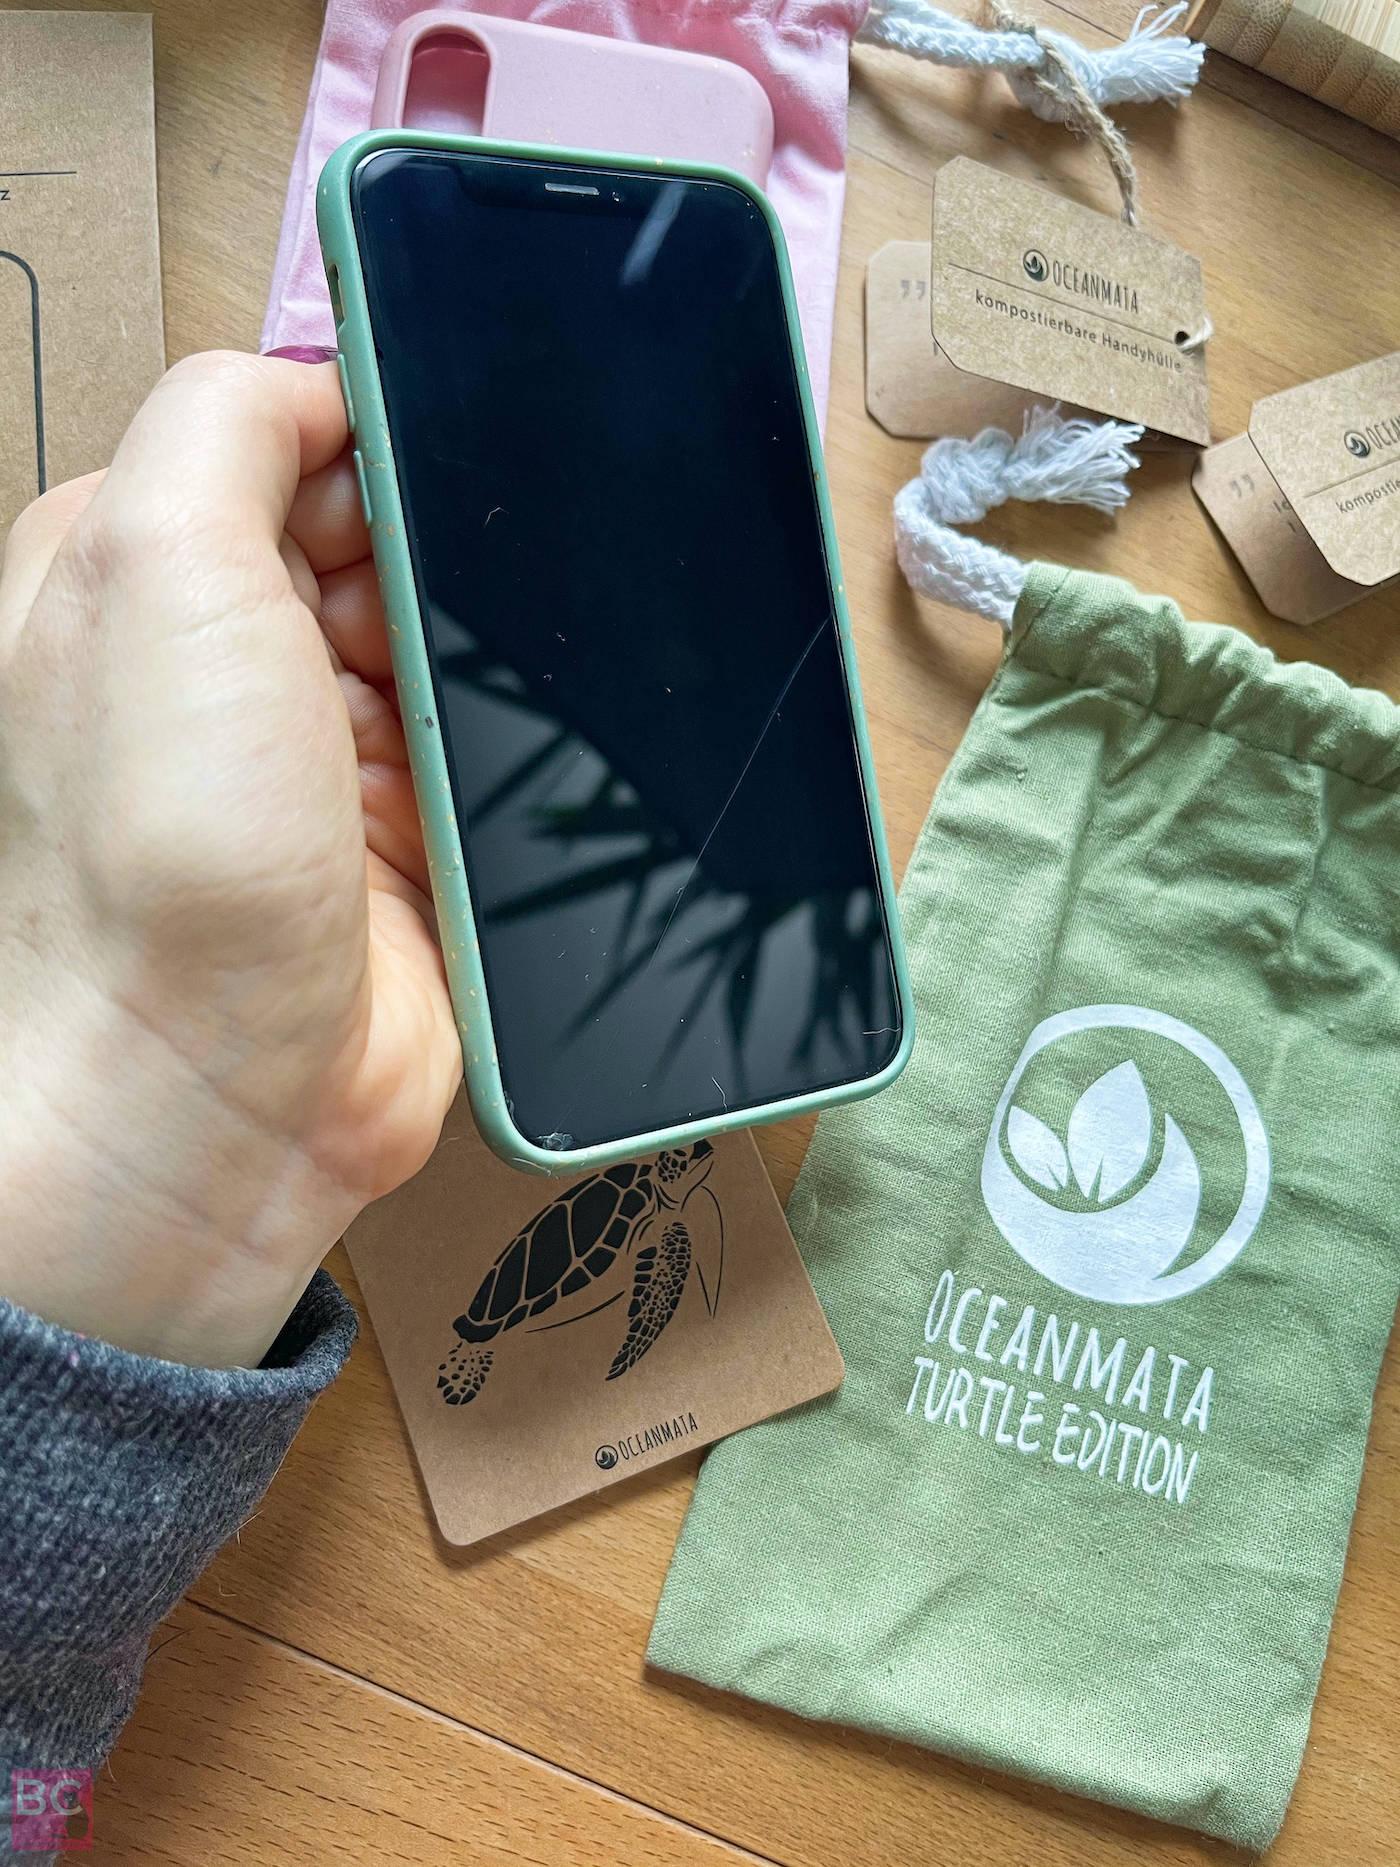 OceanMata biologische iphone Hülle TURTLE LIMITED EDITION türkis Handyhülle ohne Plastik recycelt biologisch abbaubar